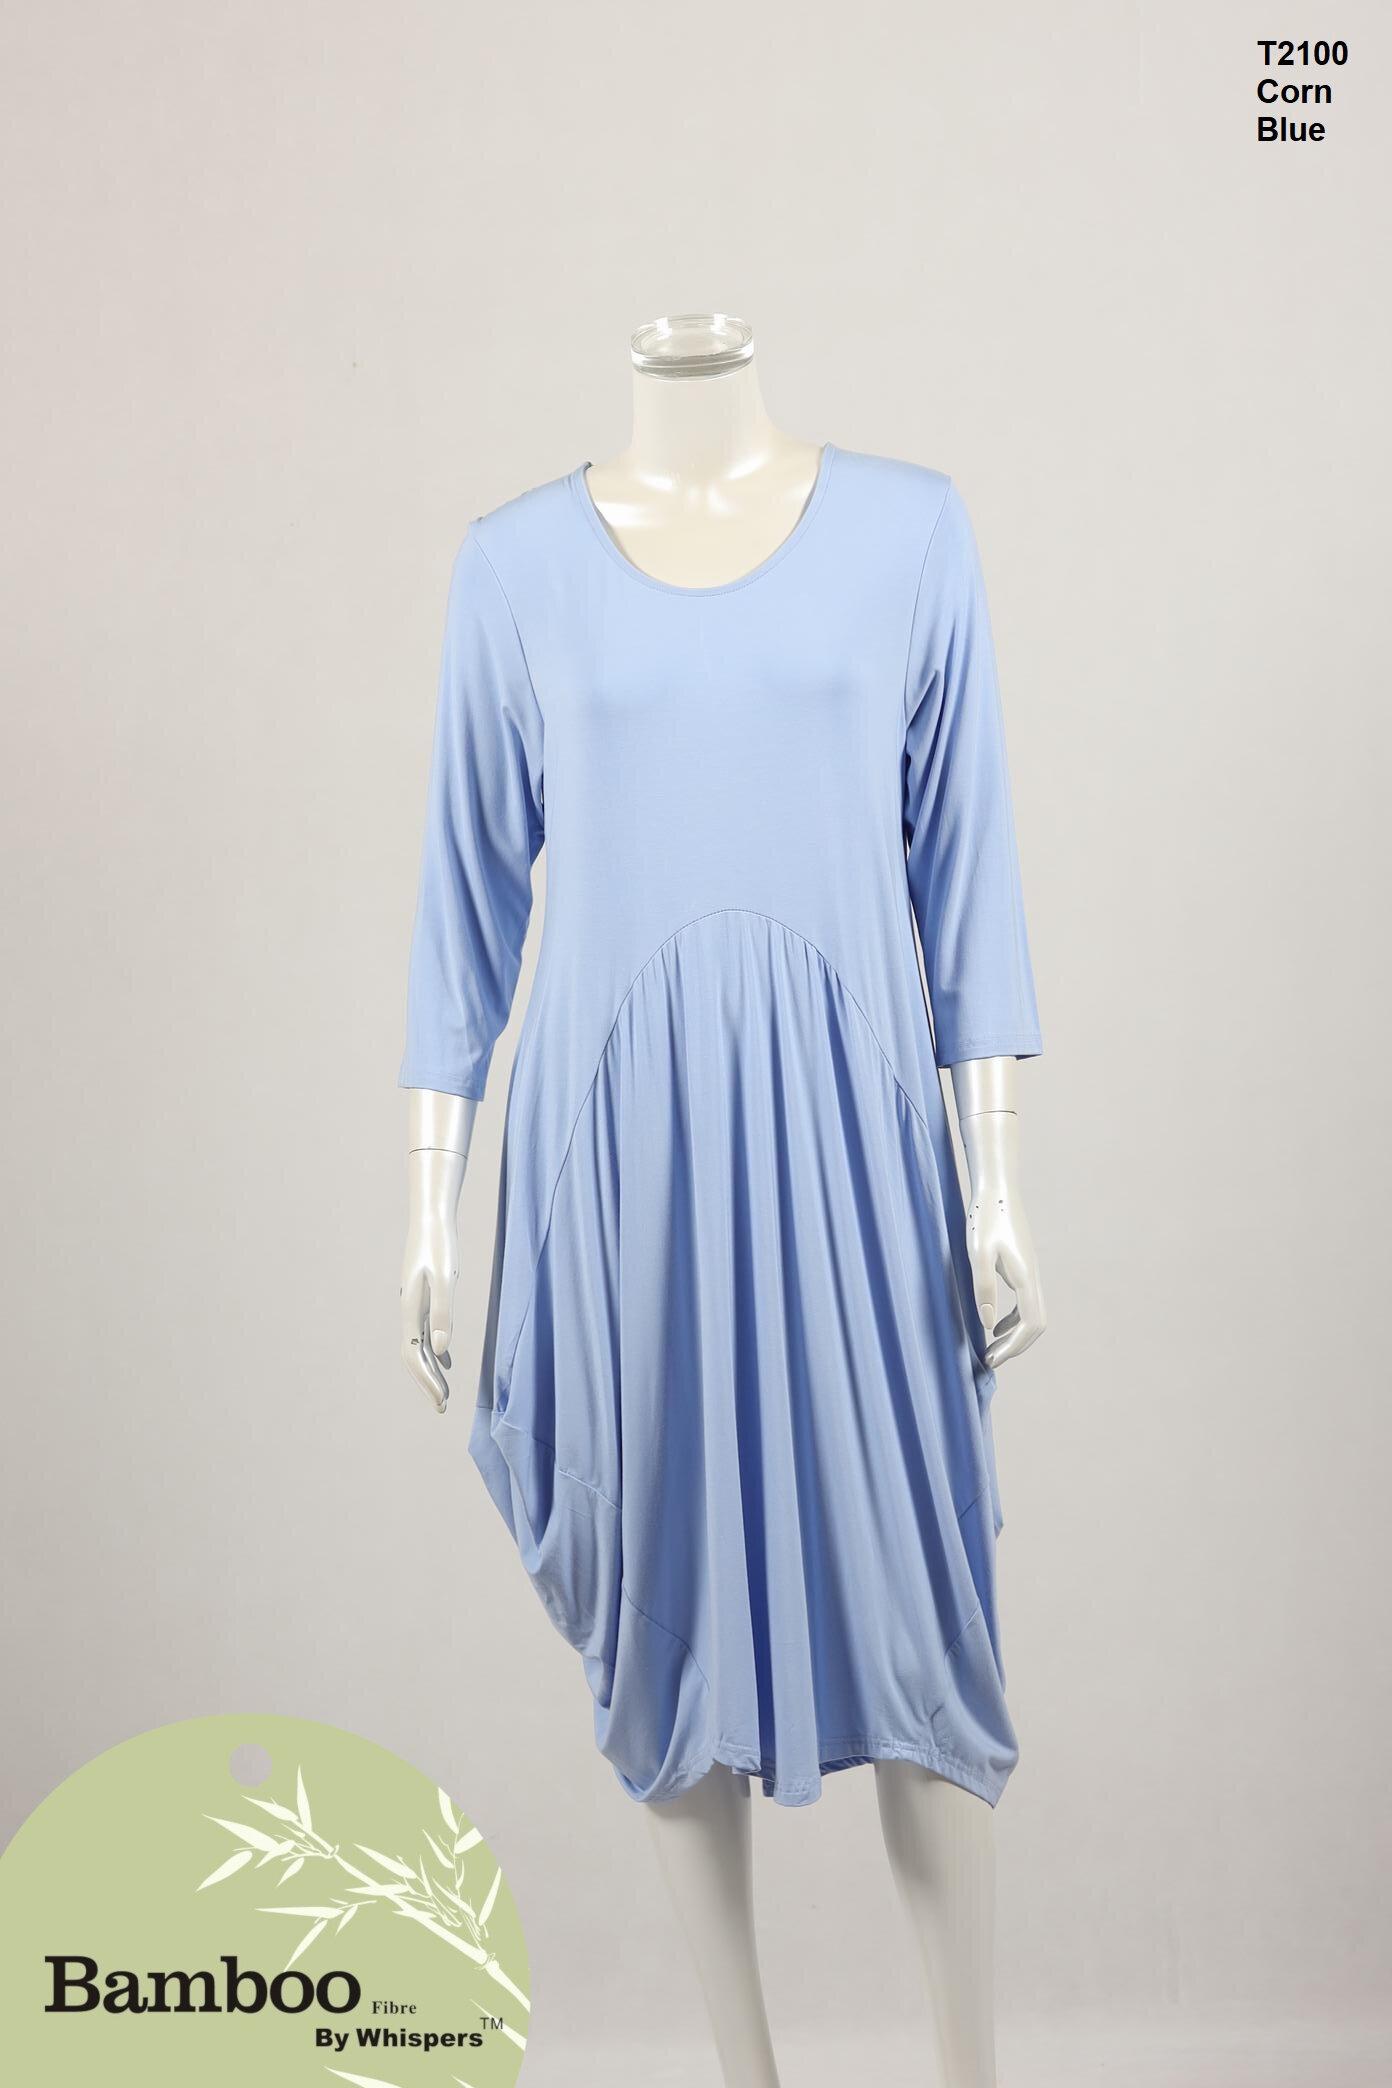 T2100-Cornflower Blue.JPG